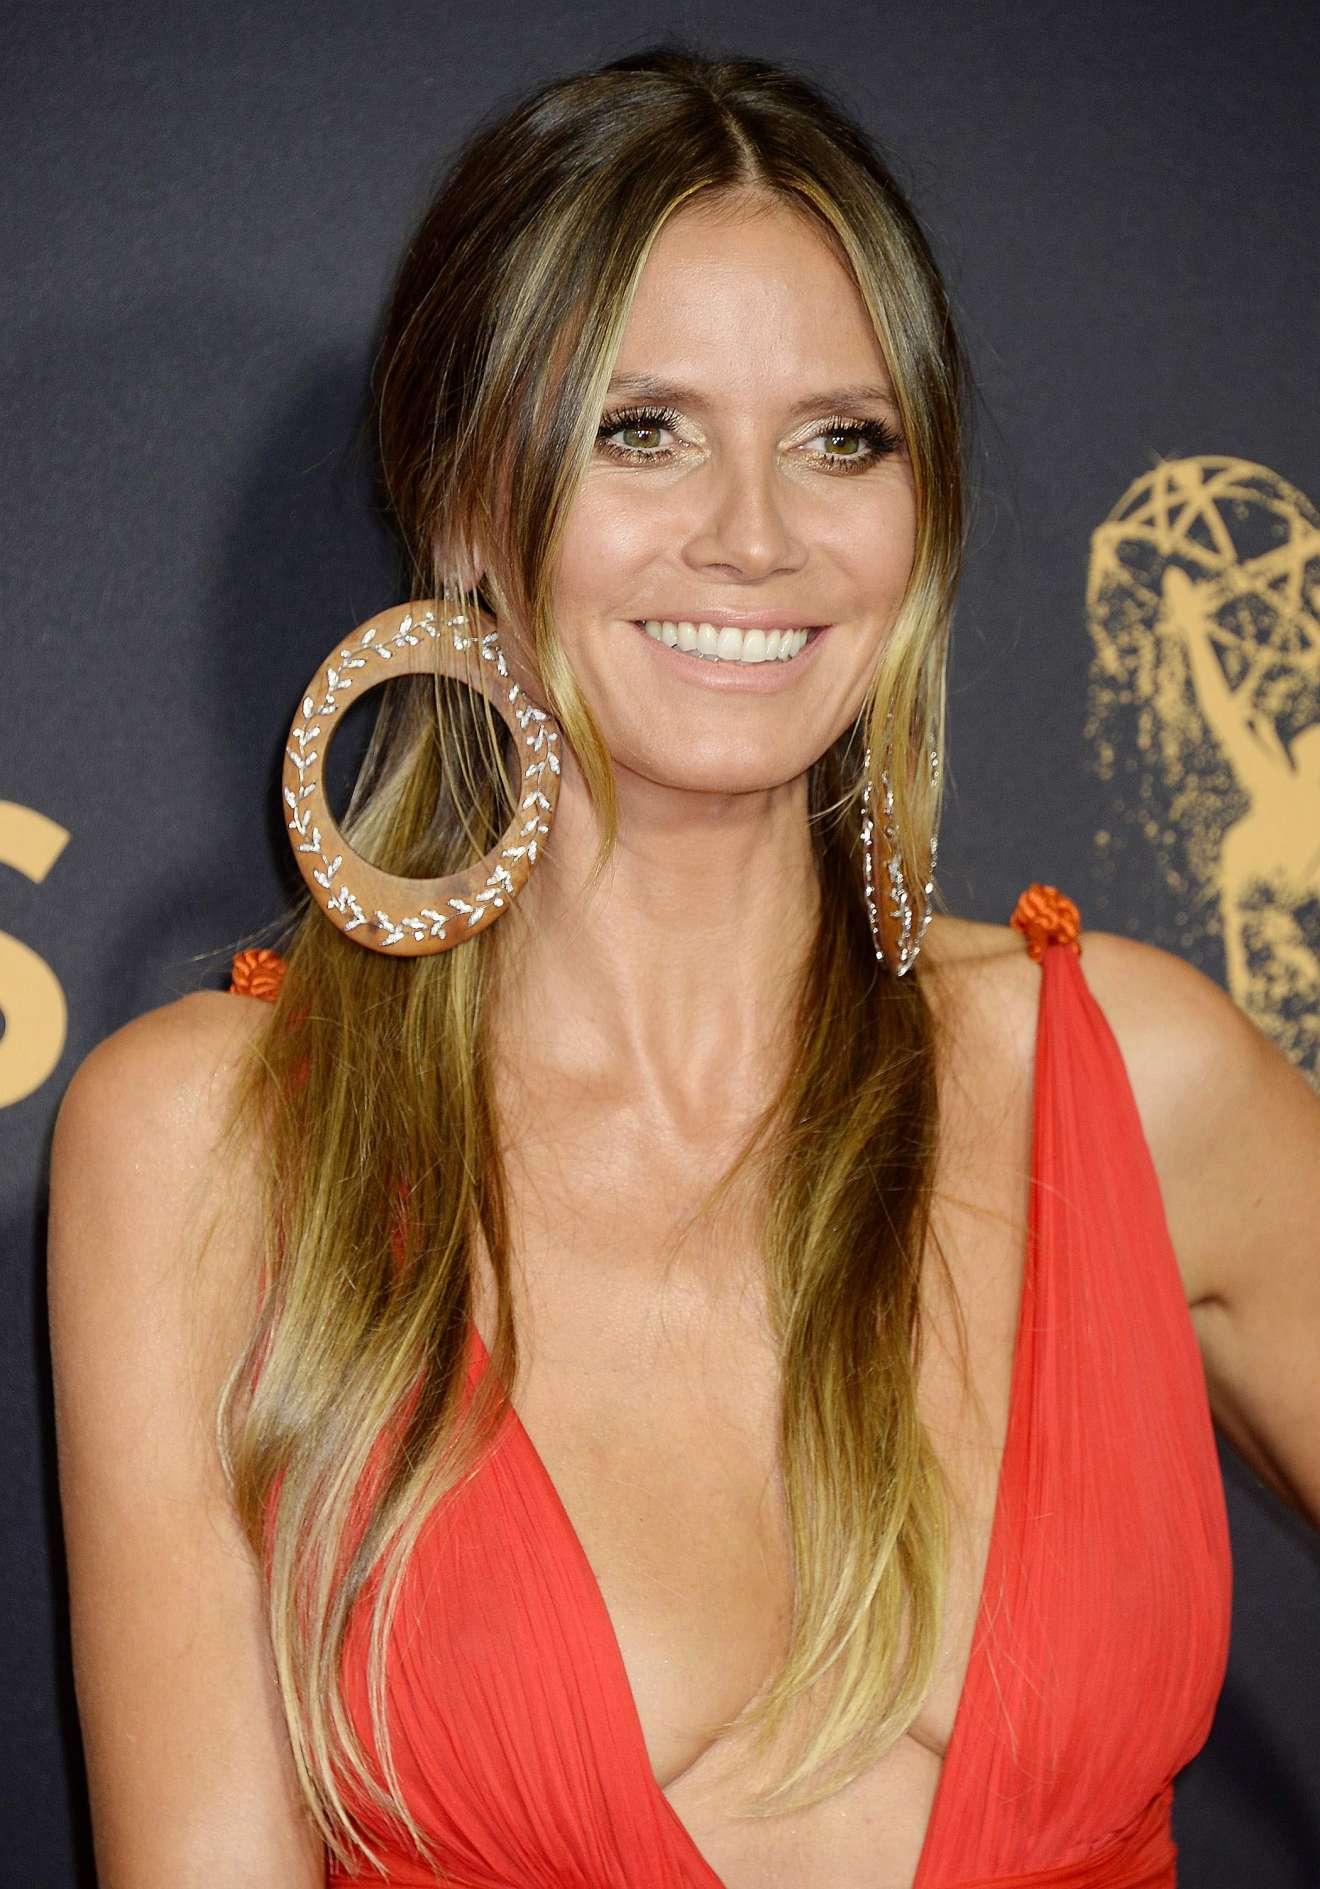 Heidi Klum - 2017 Primetime Emmy Awards in Los Angeles